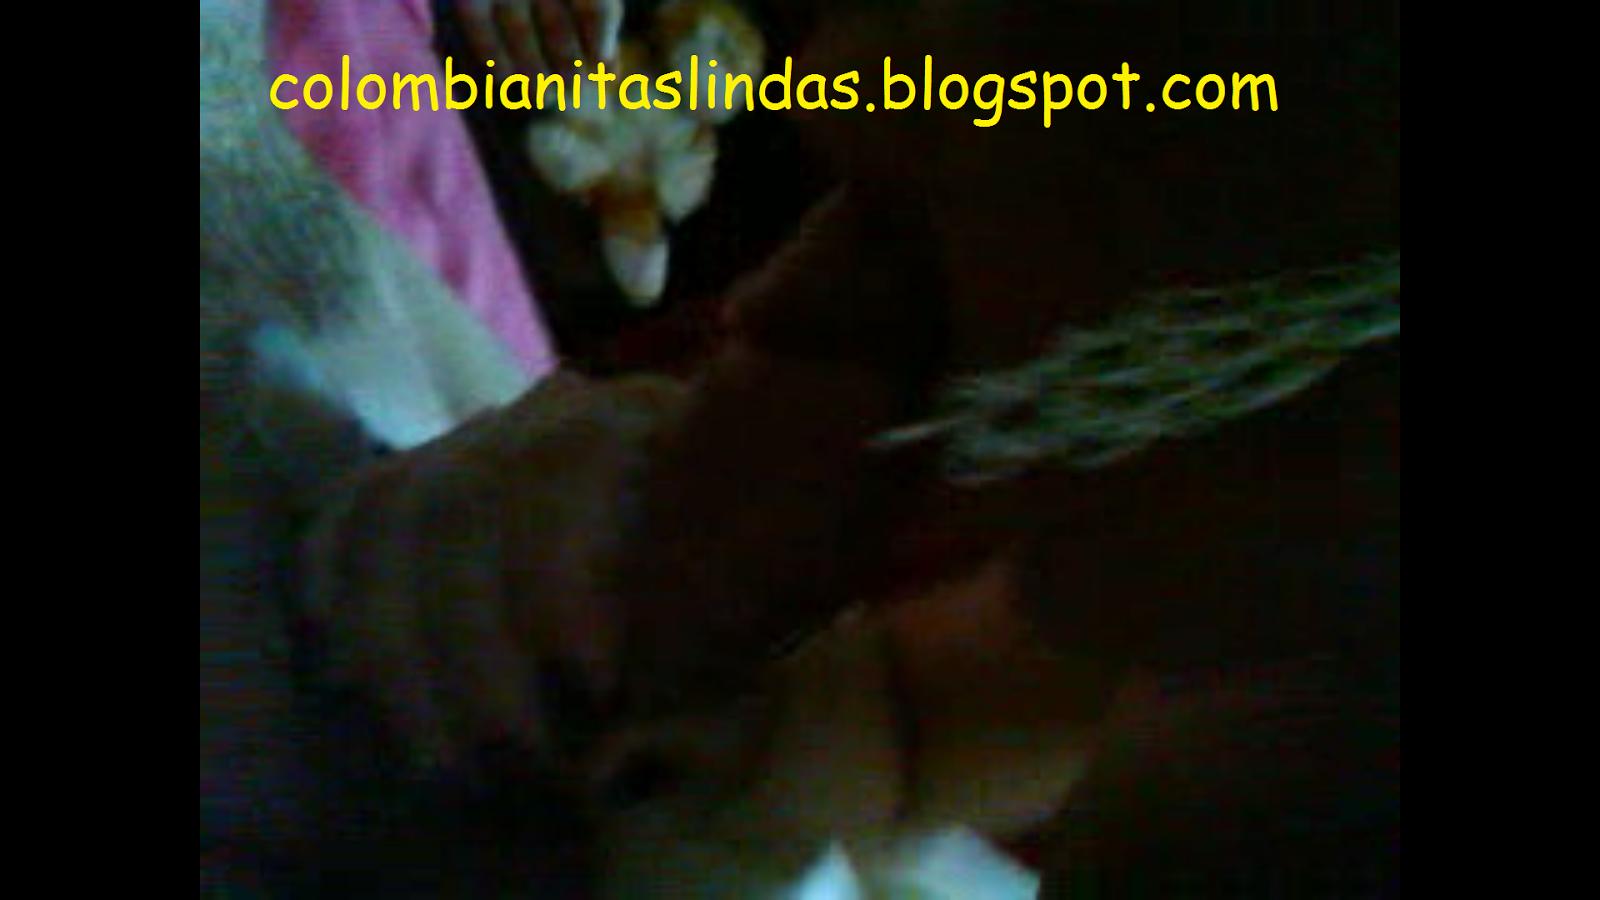 colombianitas com